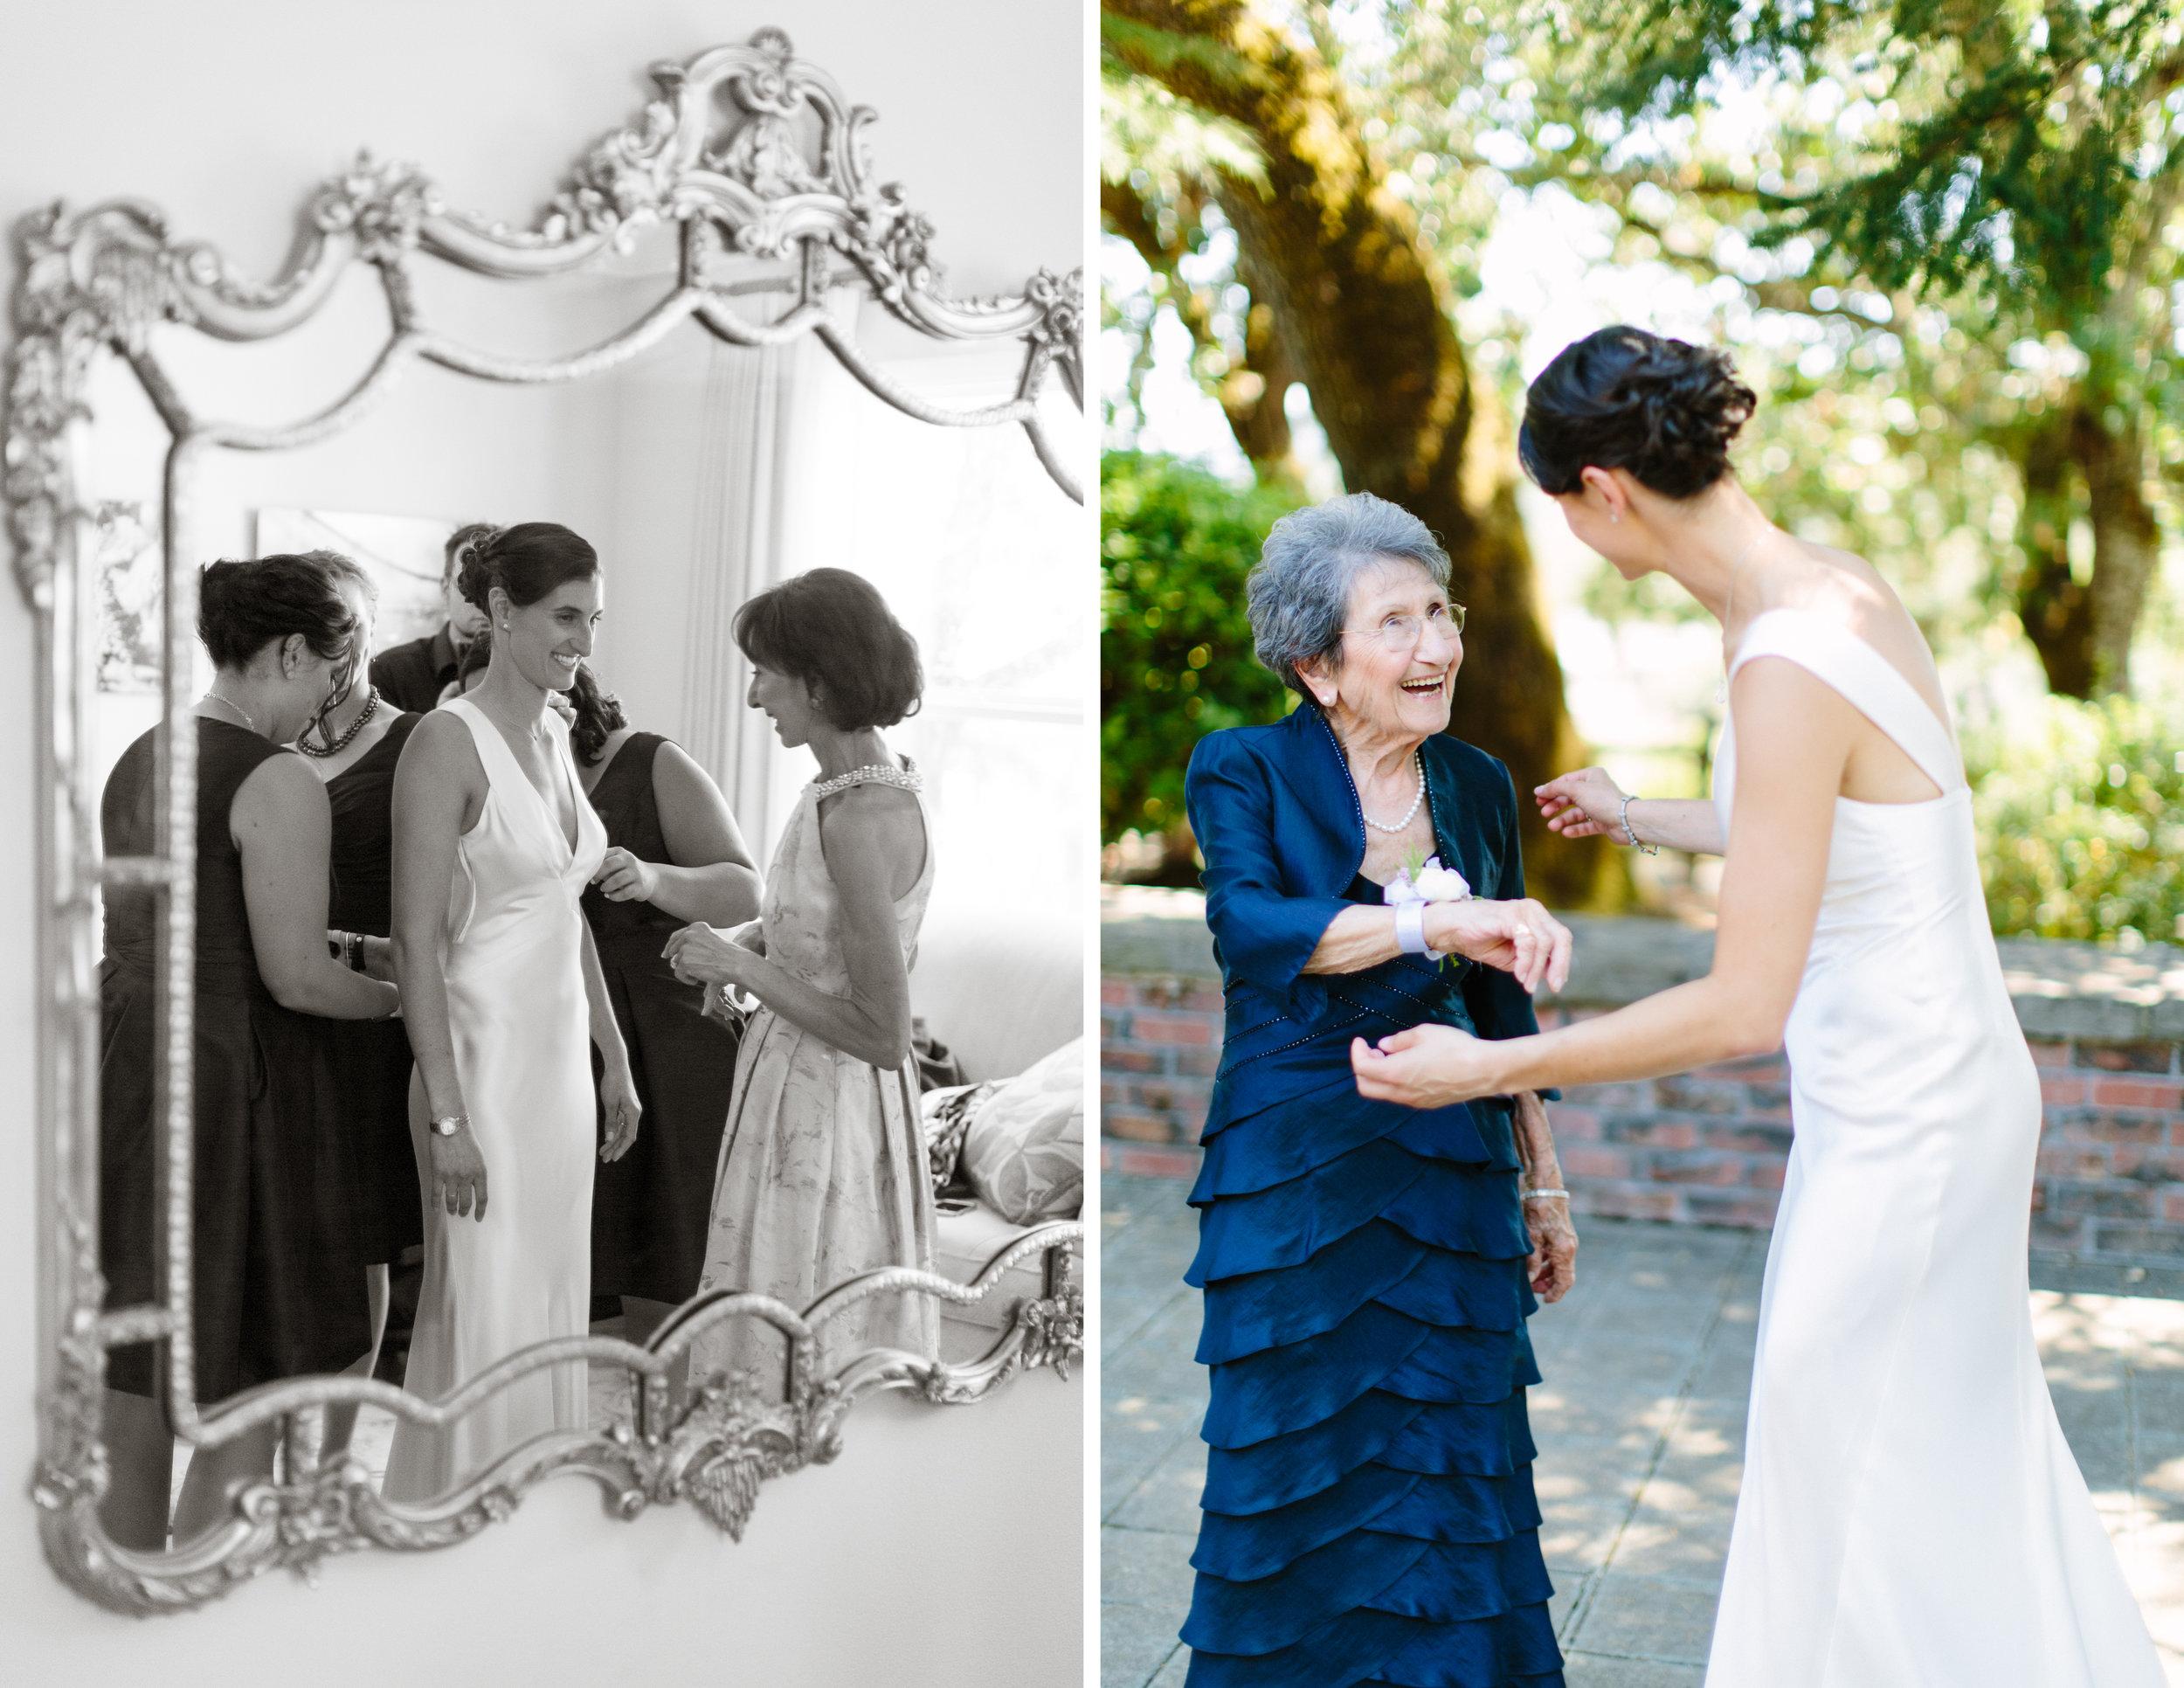 kunde estate winery wedding 3.jpg